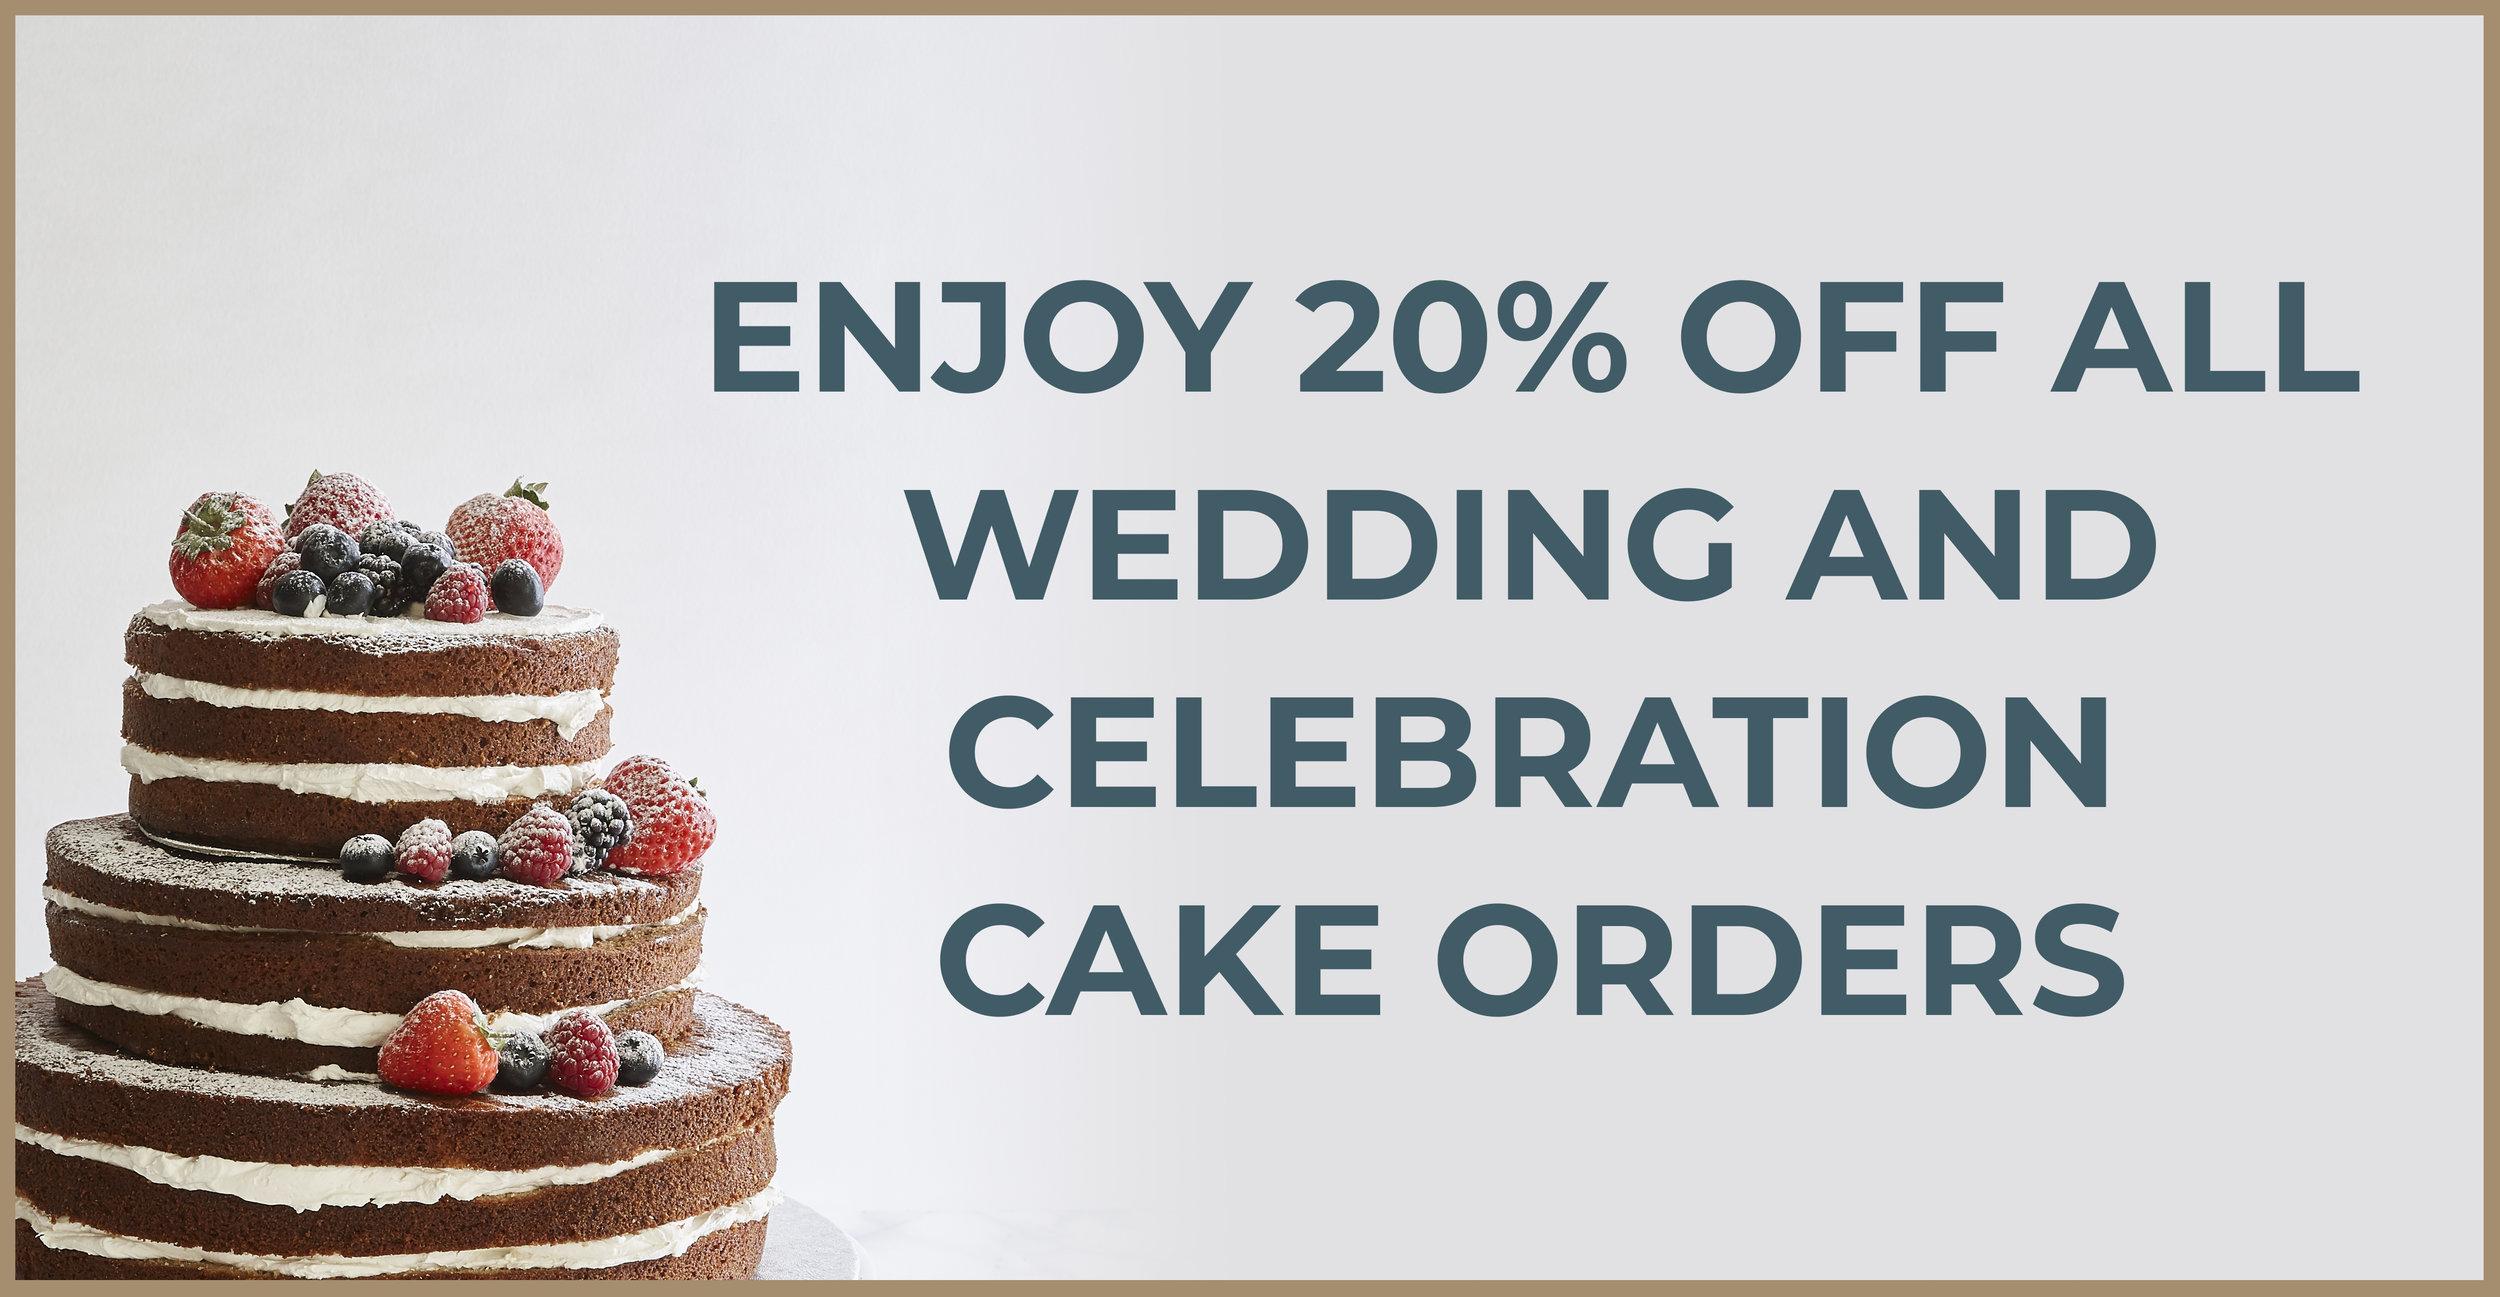 20-OFF-WEDDING-CELEBTRATION.jpg